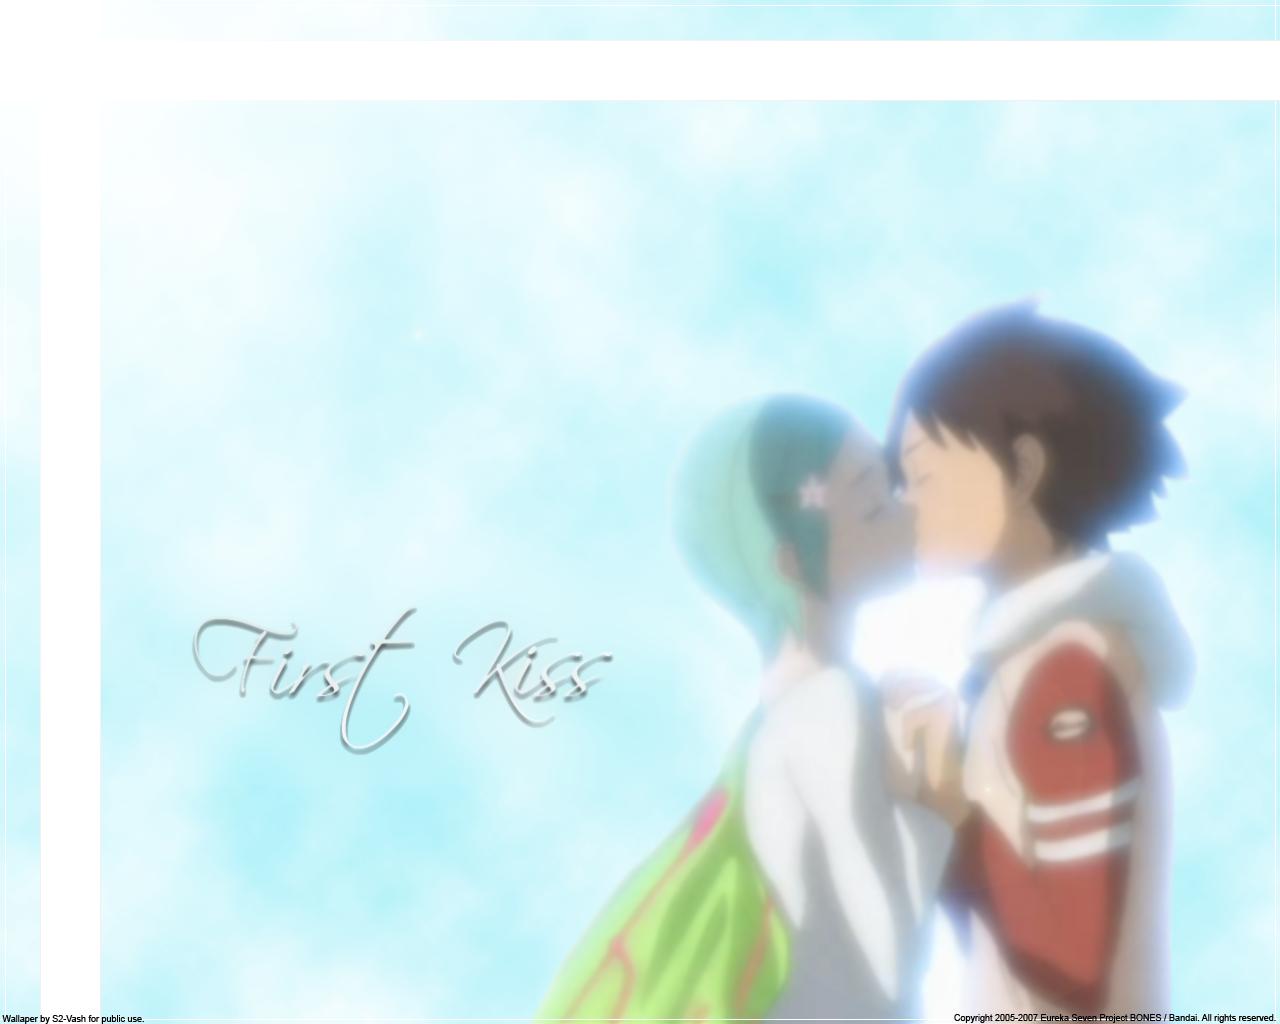 Eureka Seven Nude in eureka seven: first kisss2vash.deviantart on @deviantart